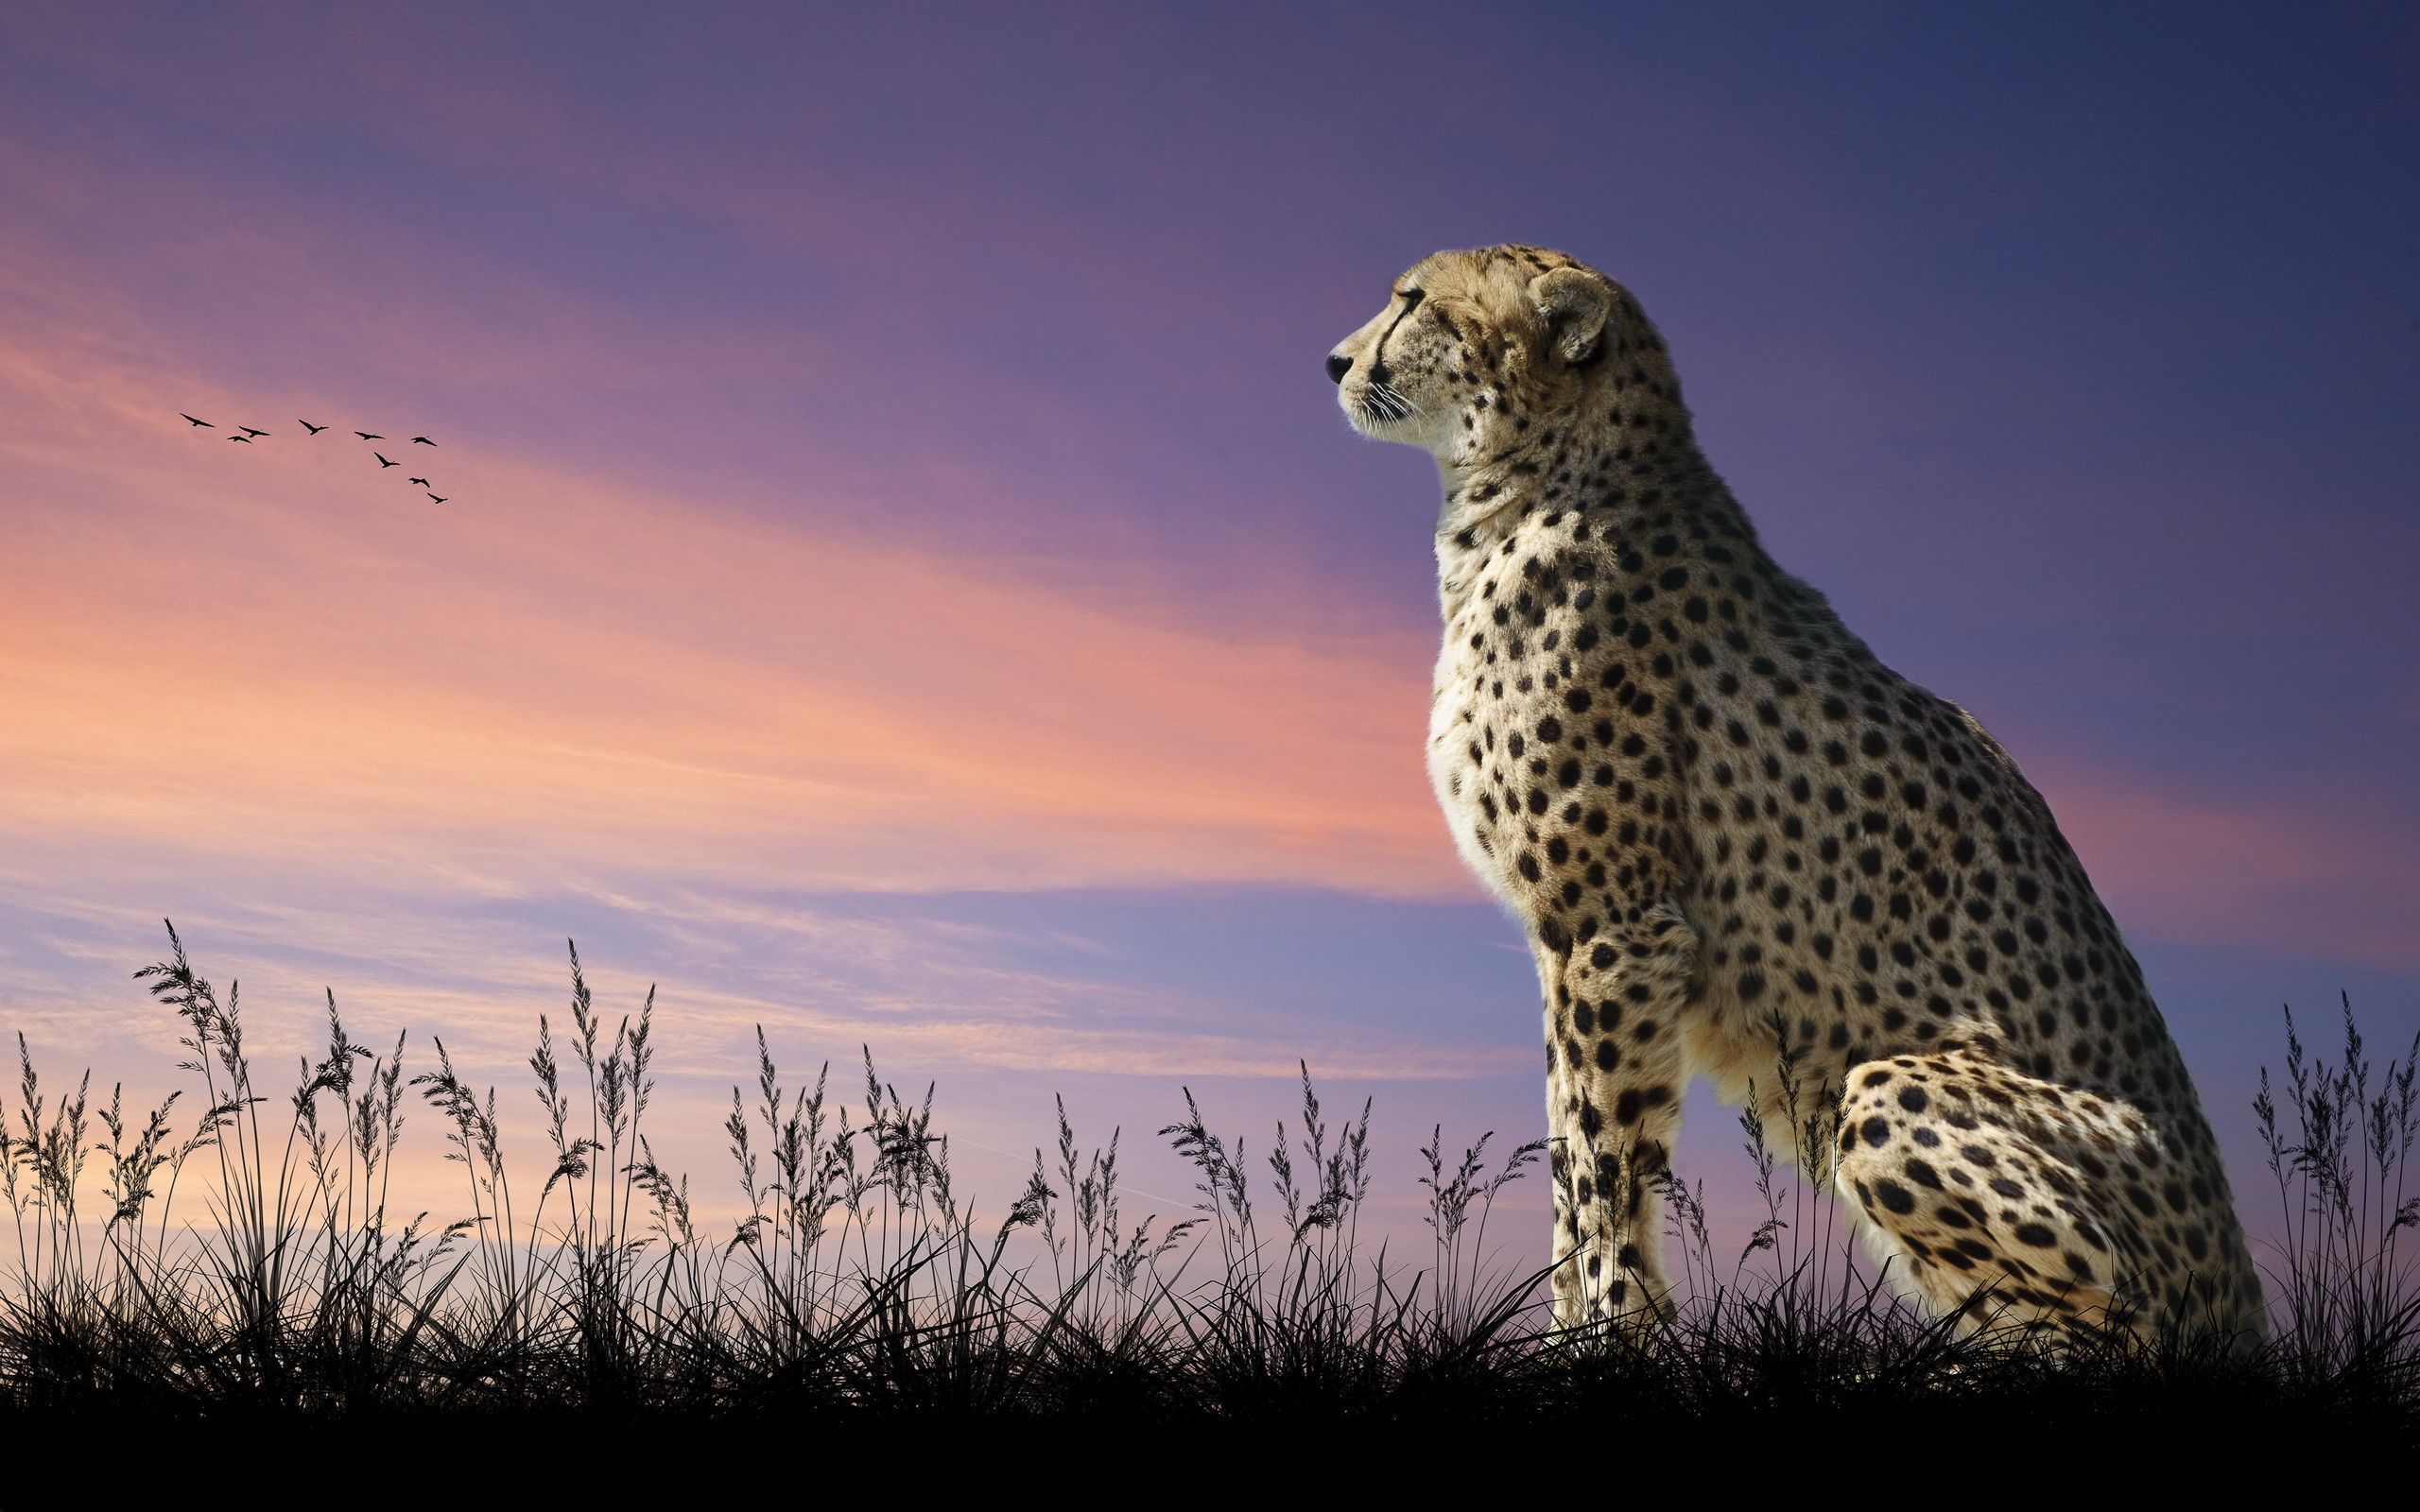 Cheetah Wallpapers Top Free Cheetah Backgrounds Wallpaperaccess